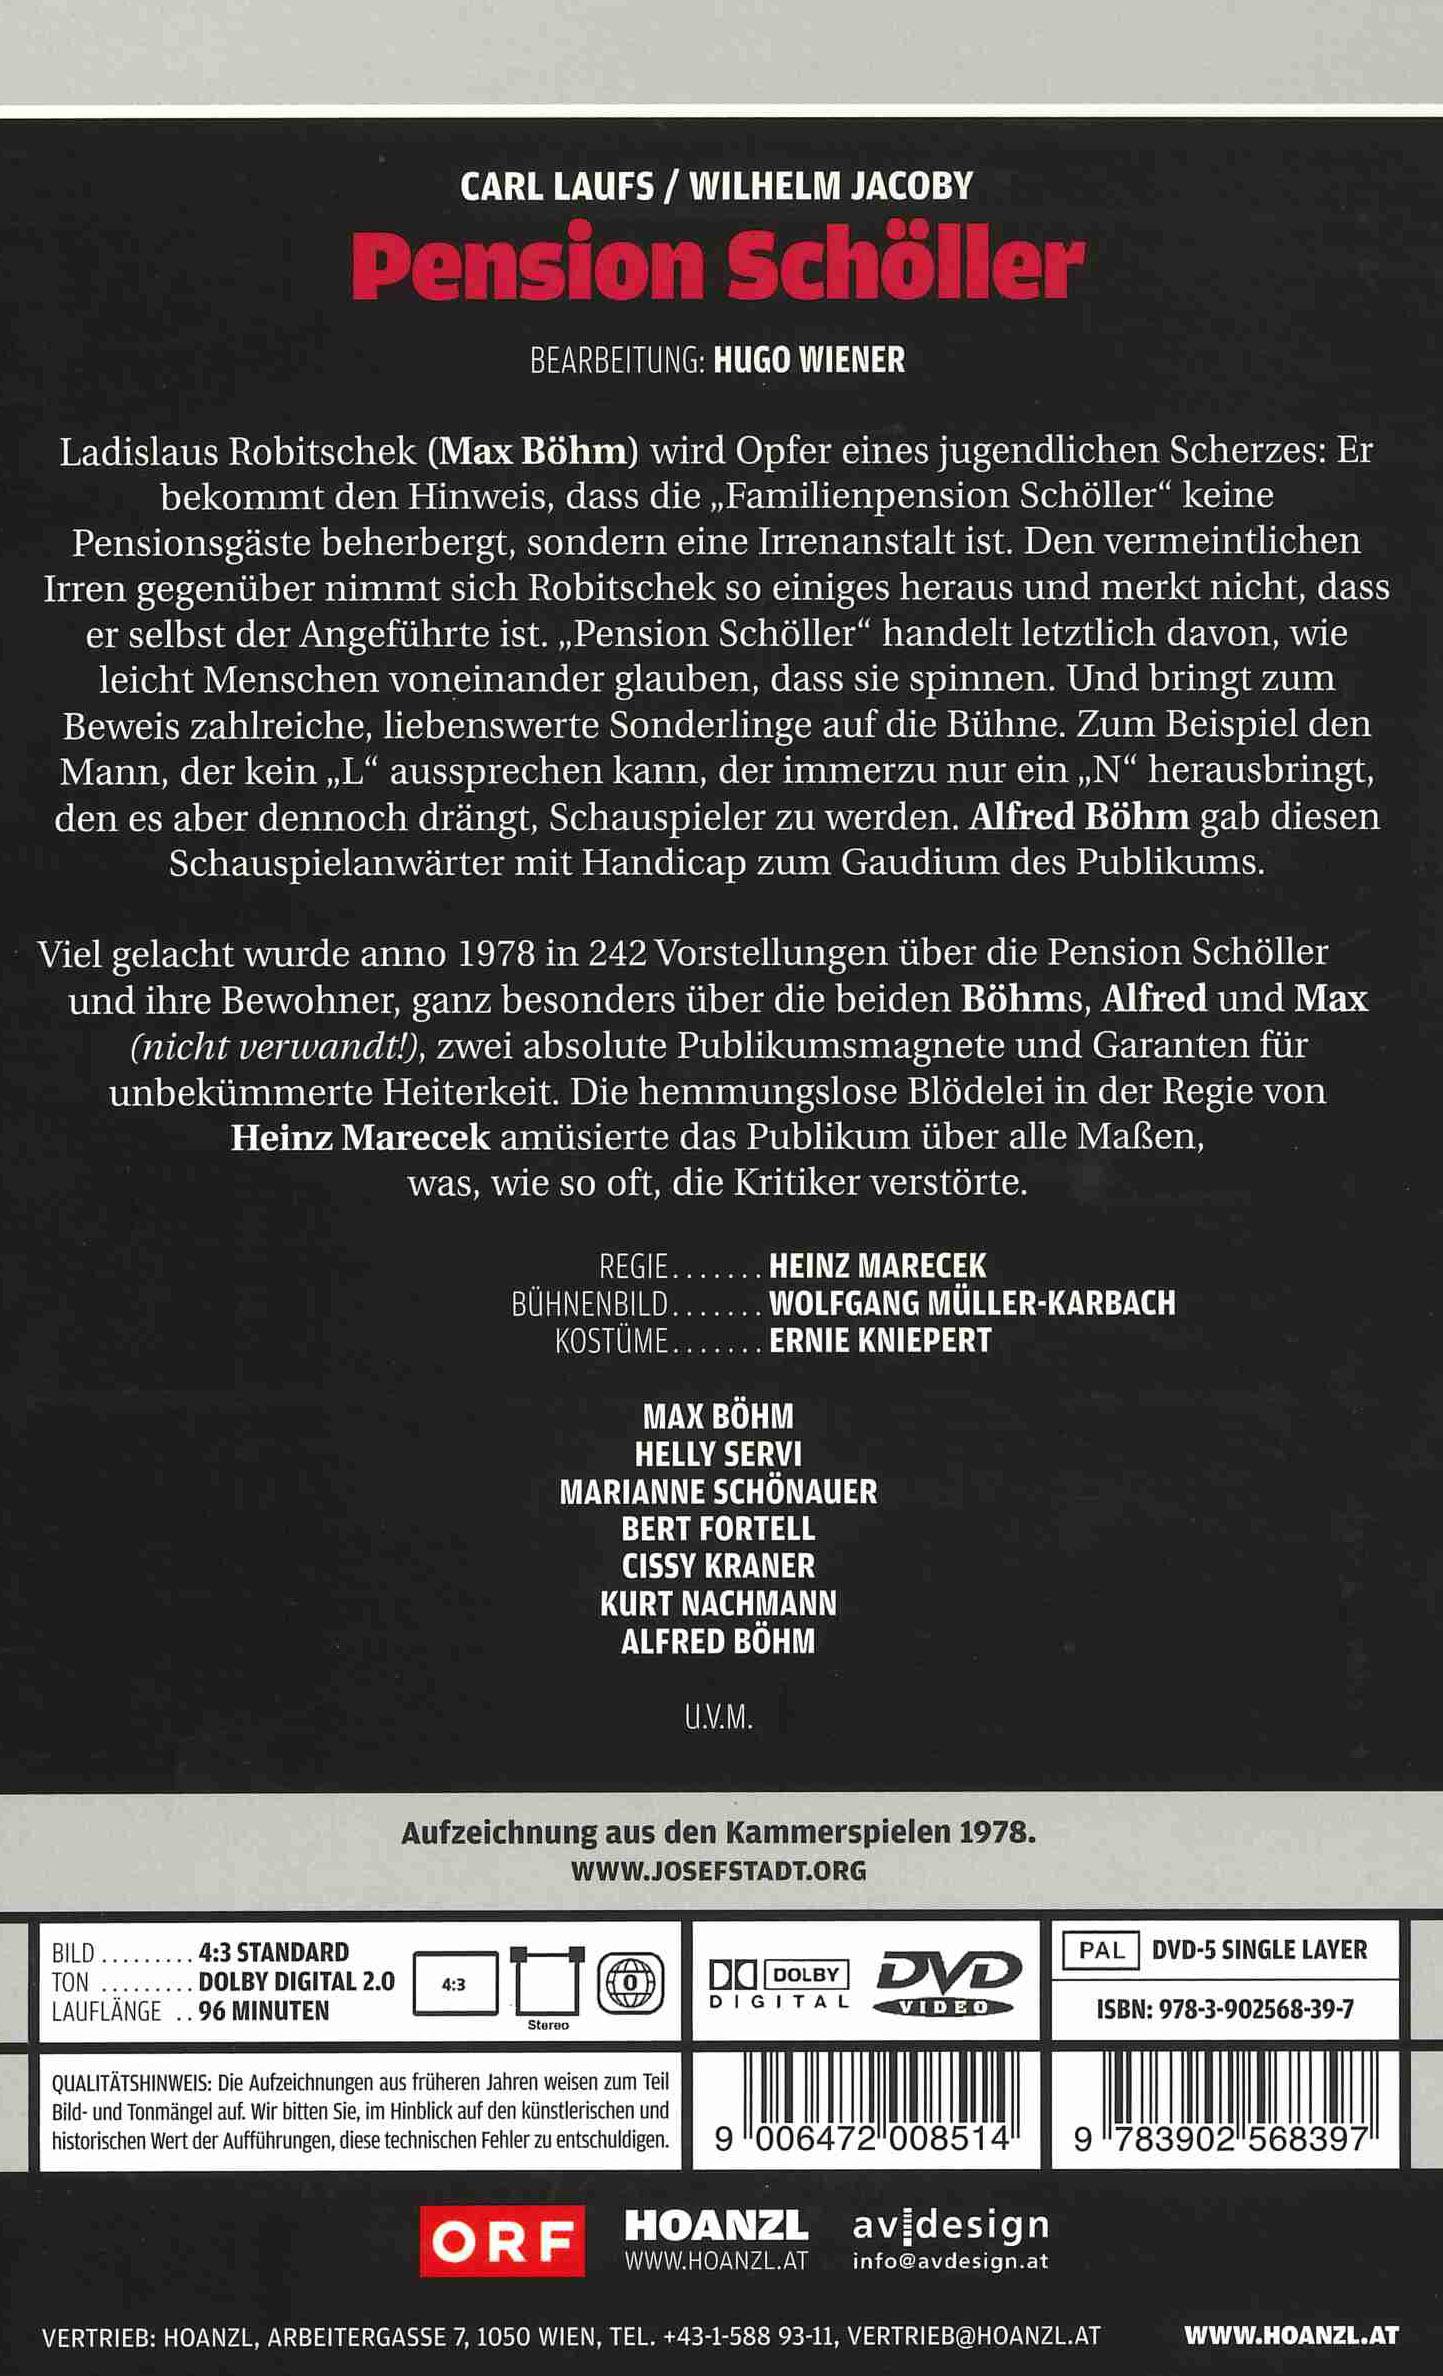 09 Pension Schöller Edition Josefstadt Dvd Orf Shop